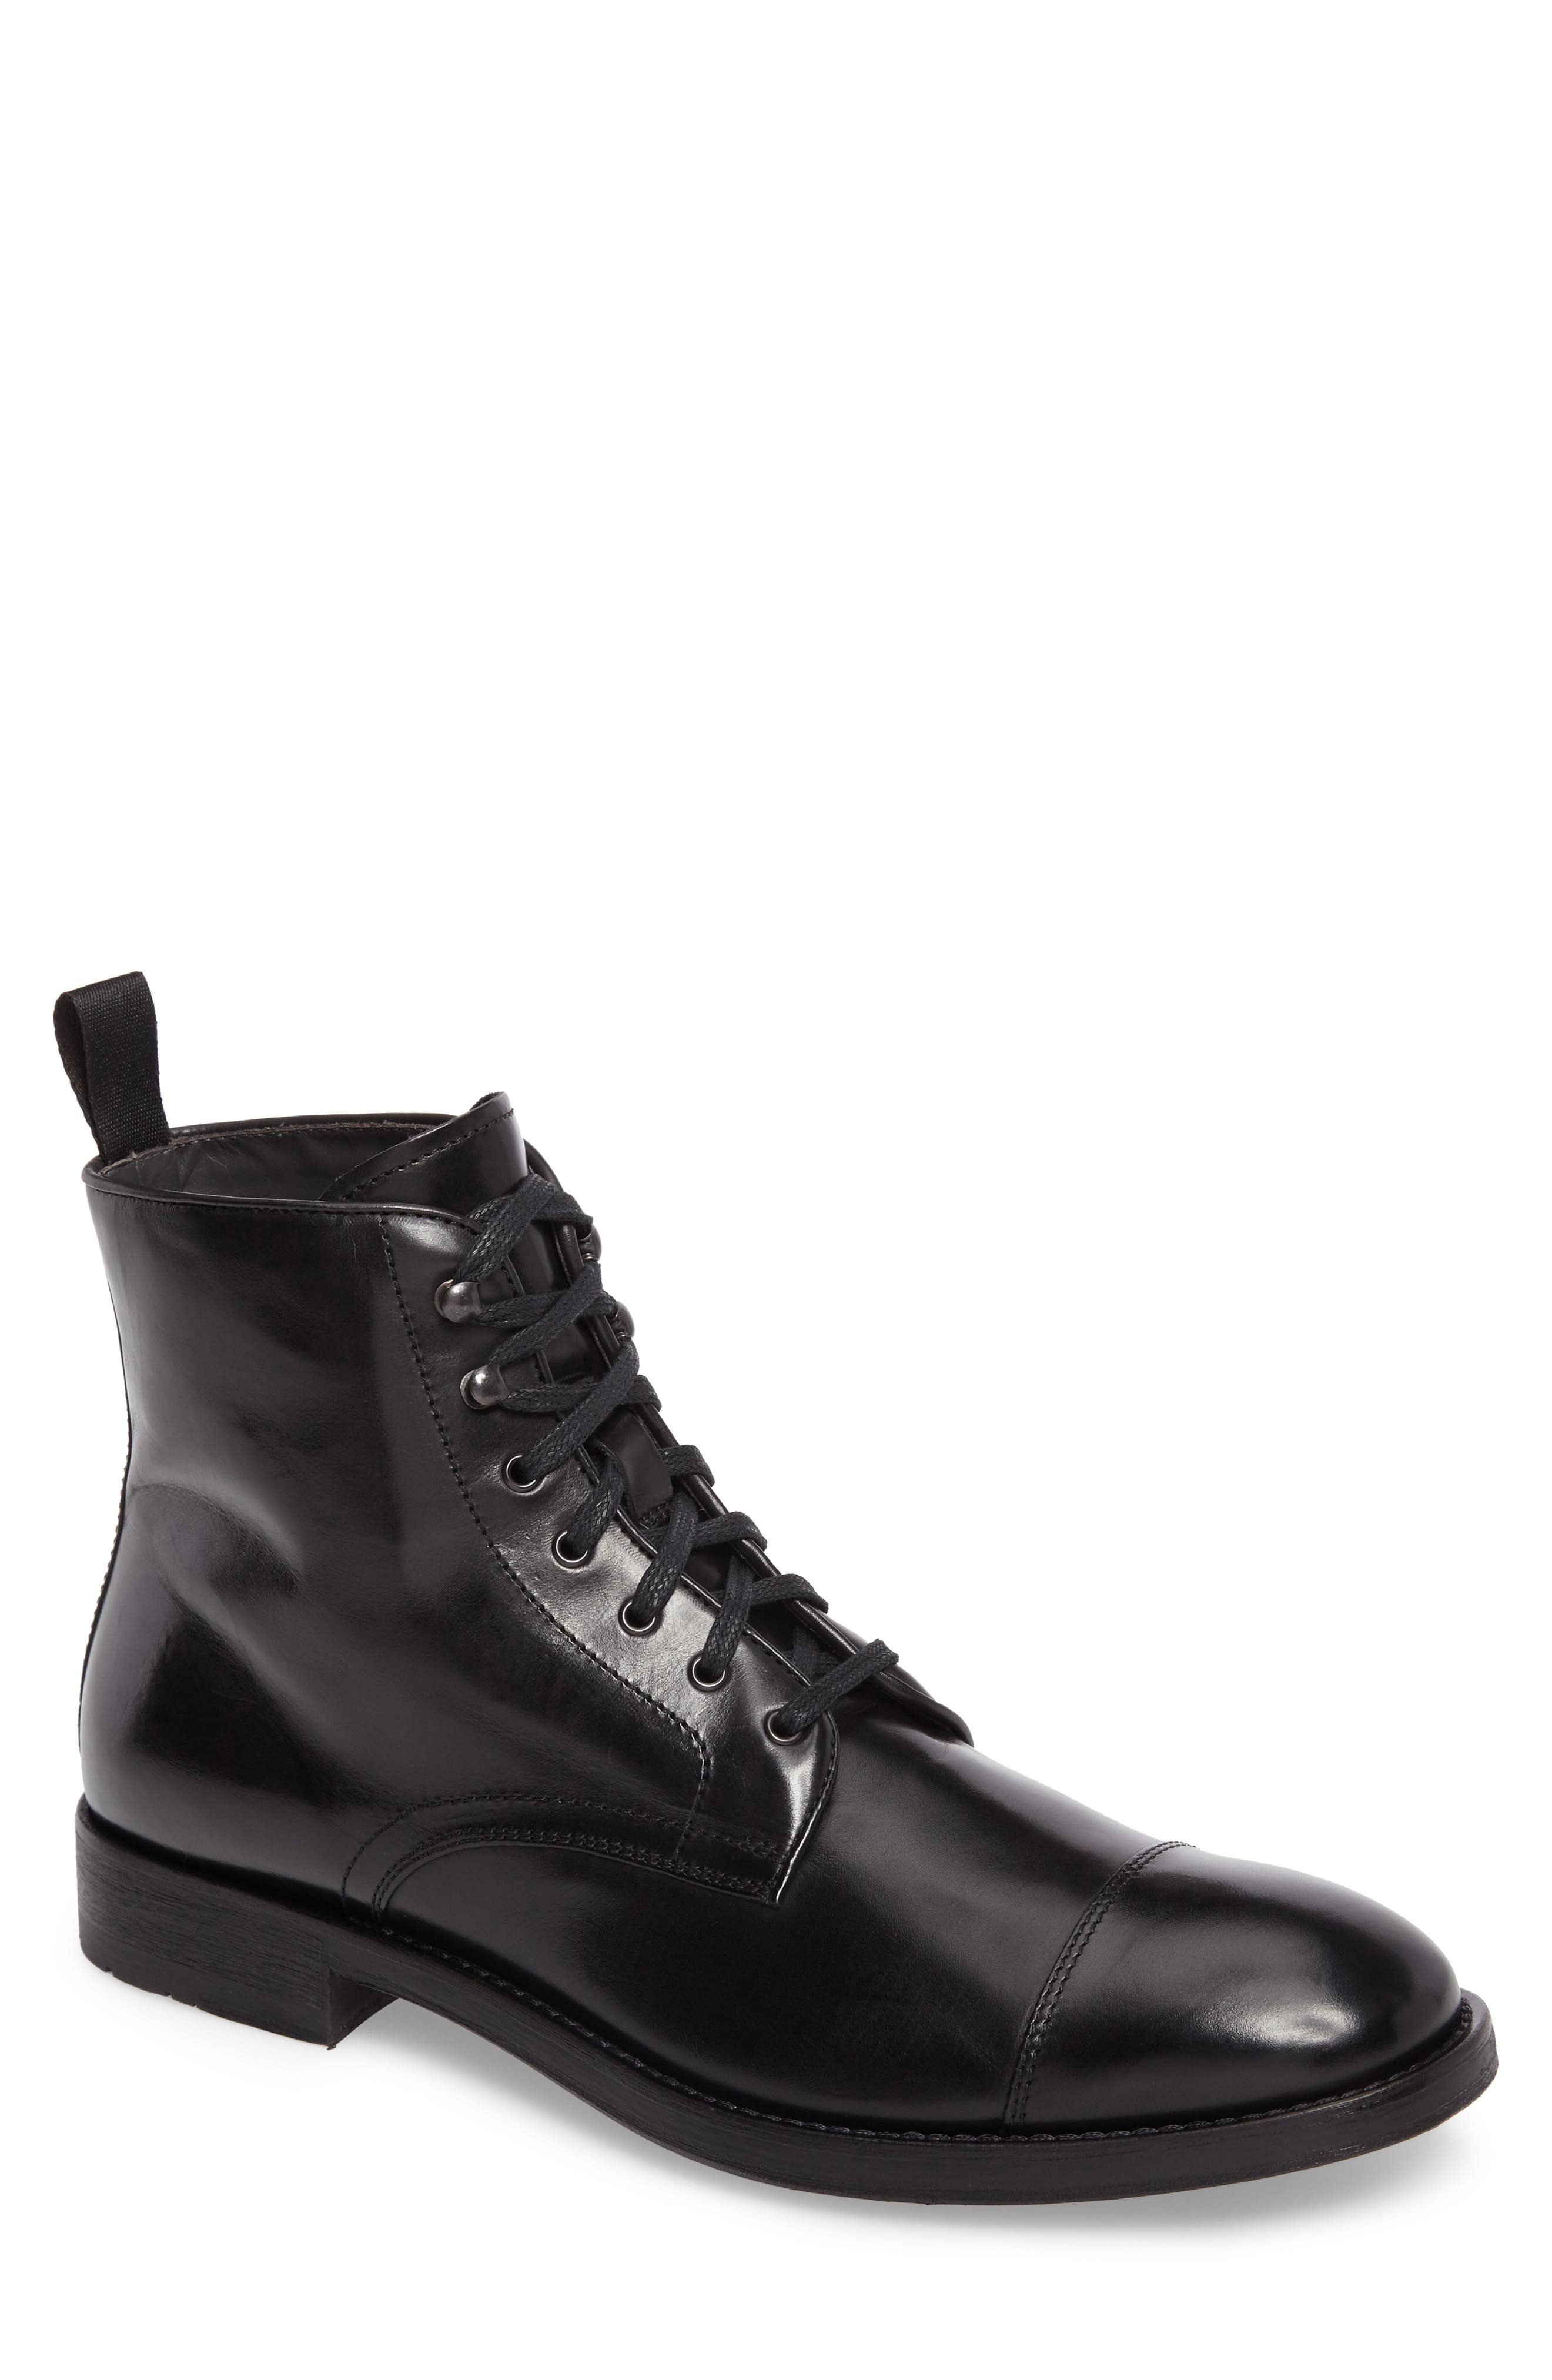 Bondfield Cap Toe Boot,                             Main thumbnail 1, color,                             Black